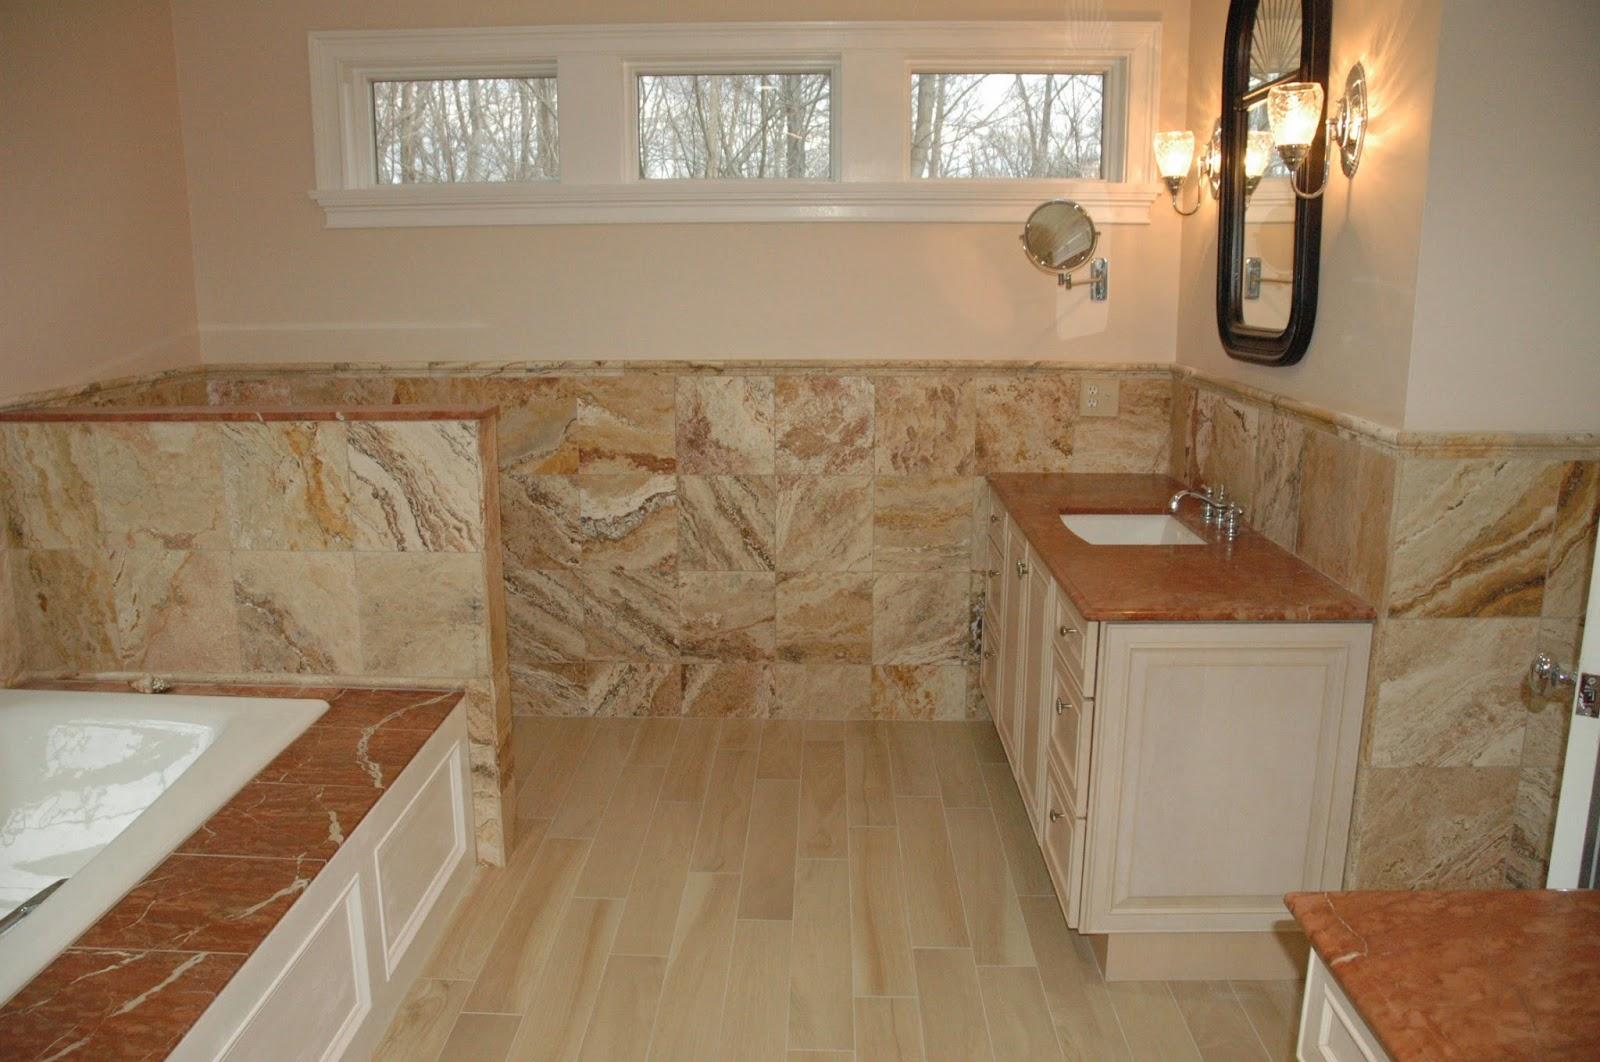 Custom bathroom remodeling 12x12 travertinetile for Bathroom designs 12x12